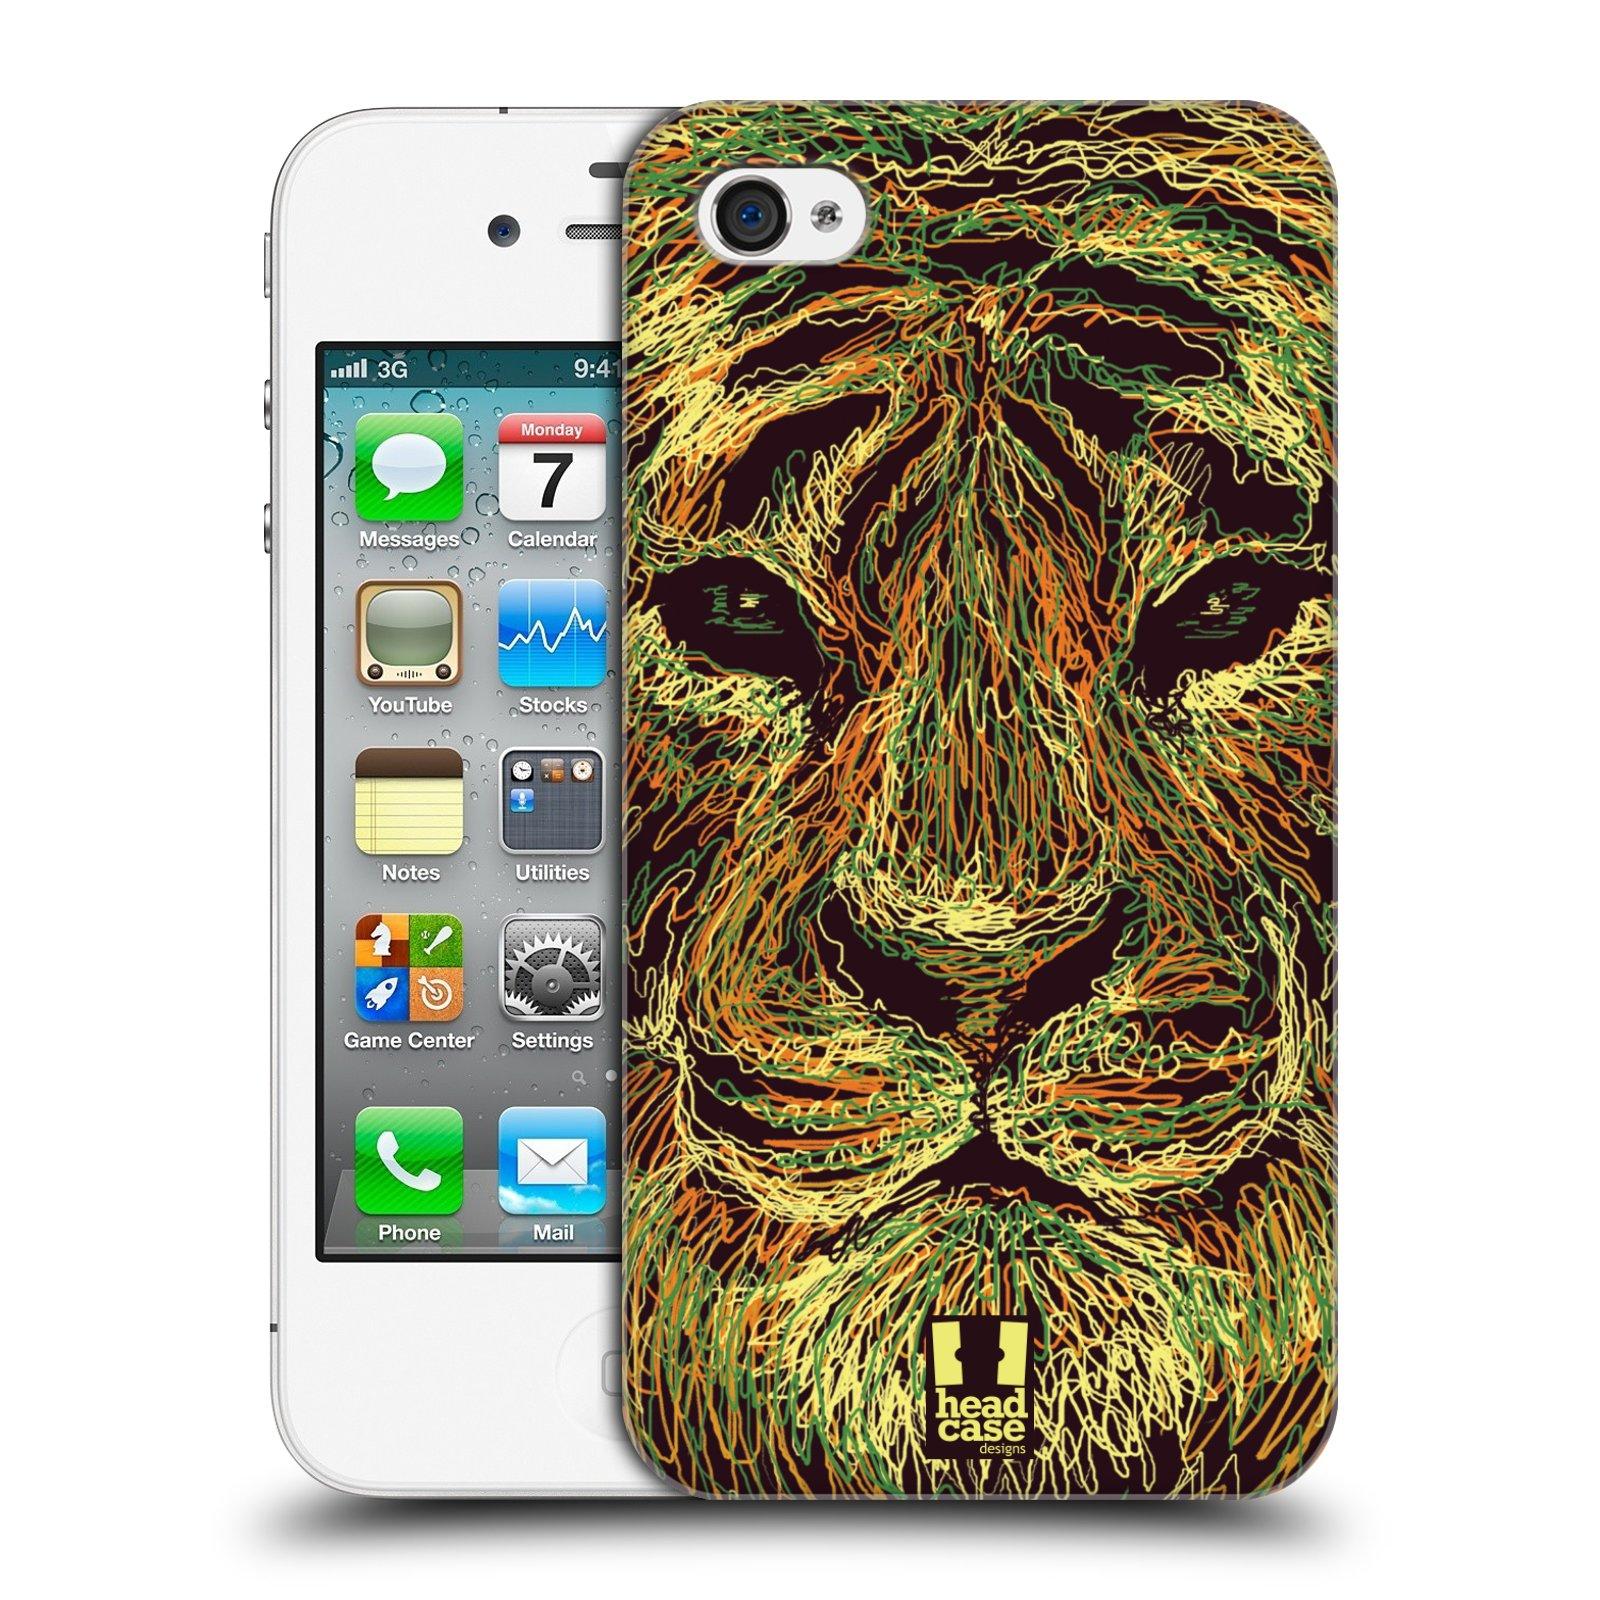 HEAD CASE plastový obal na mobil Apple Iphone 4/4S vzor zvíře čmáranice tygr